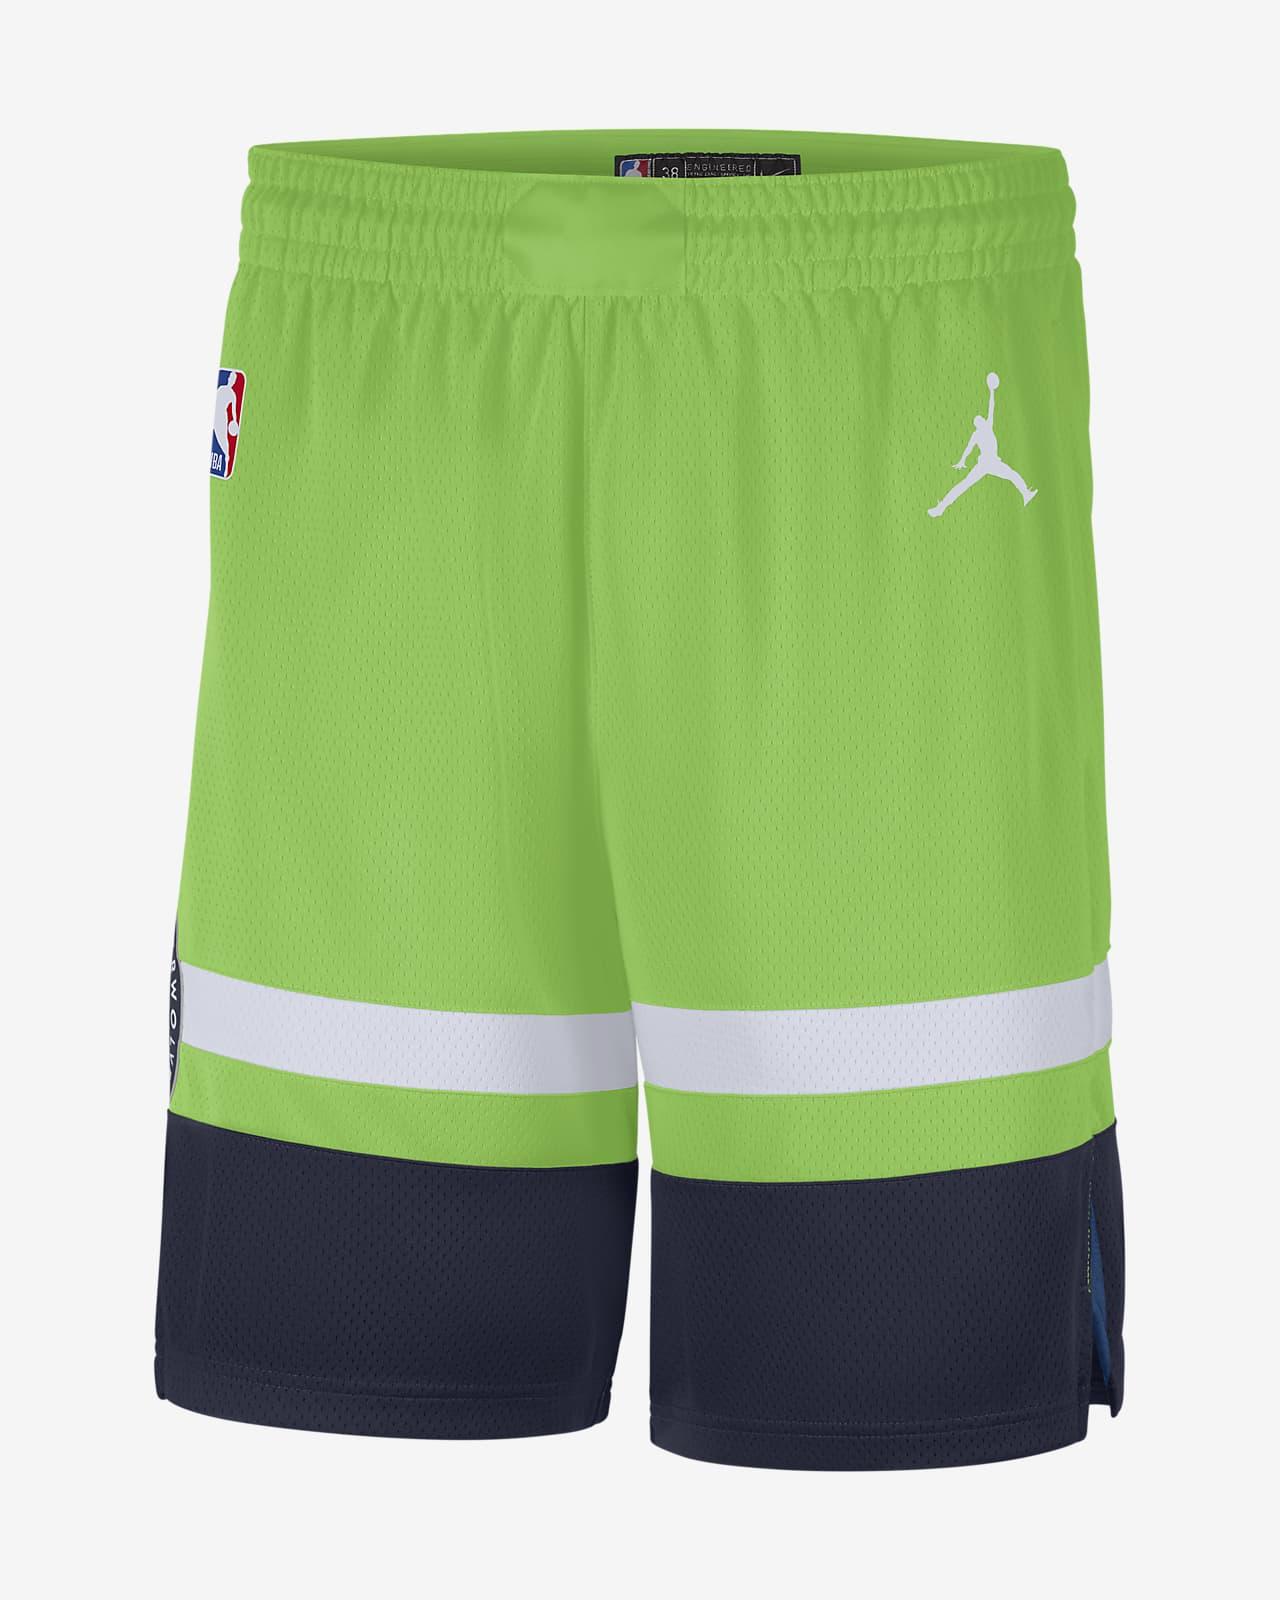 Timberwolves Statement Edition 2020 Jordan NBA Swingman férfi rövidnadrág